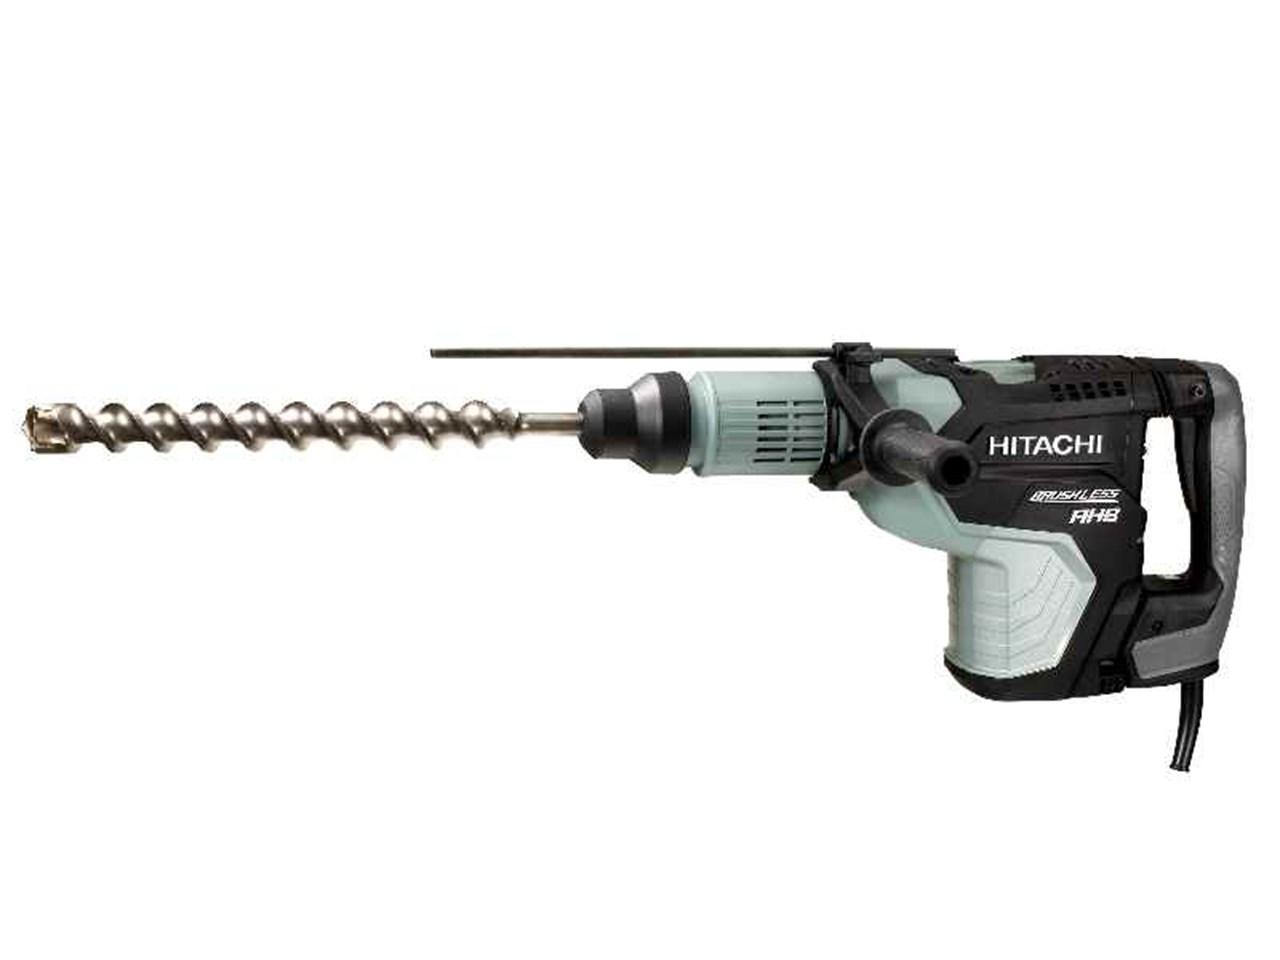 c51d68eb2cd Hitachi DH52ME J1 240V 1500W SDS Max Brushless Rotary Hammer ...